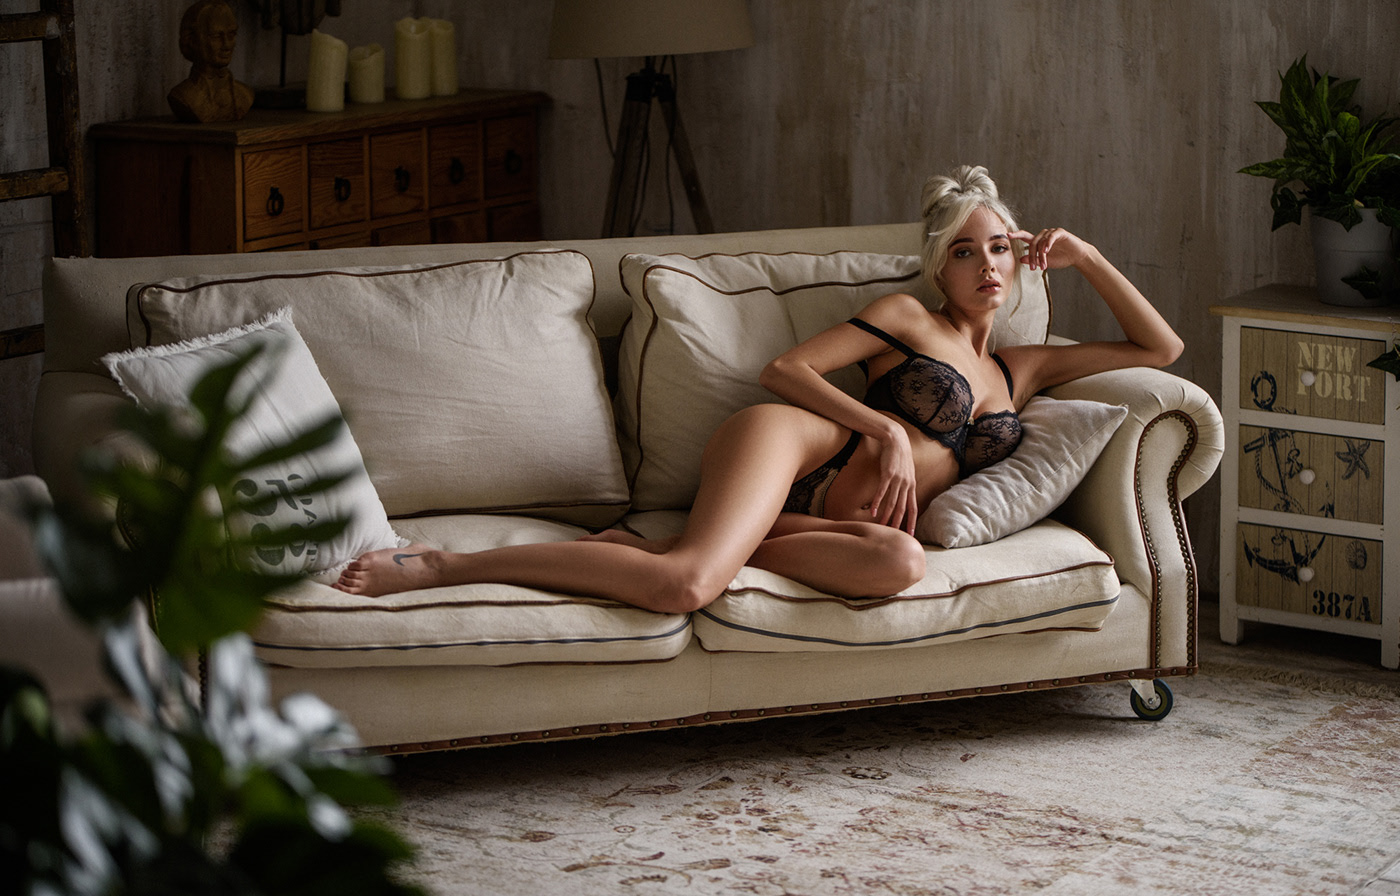 Private Audition / фотограф Sacha Leyendecker модель Катя Ширяева